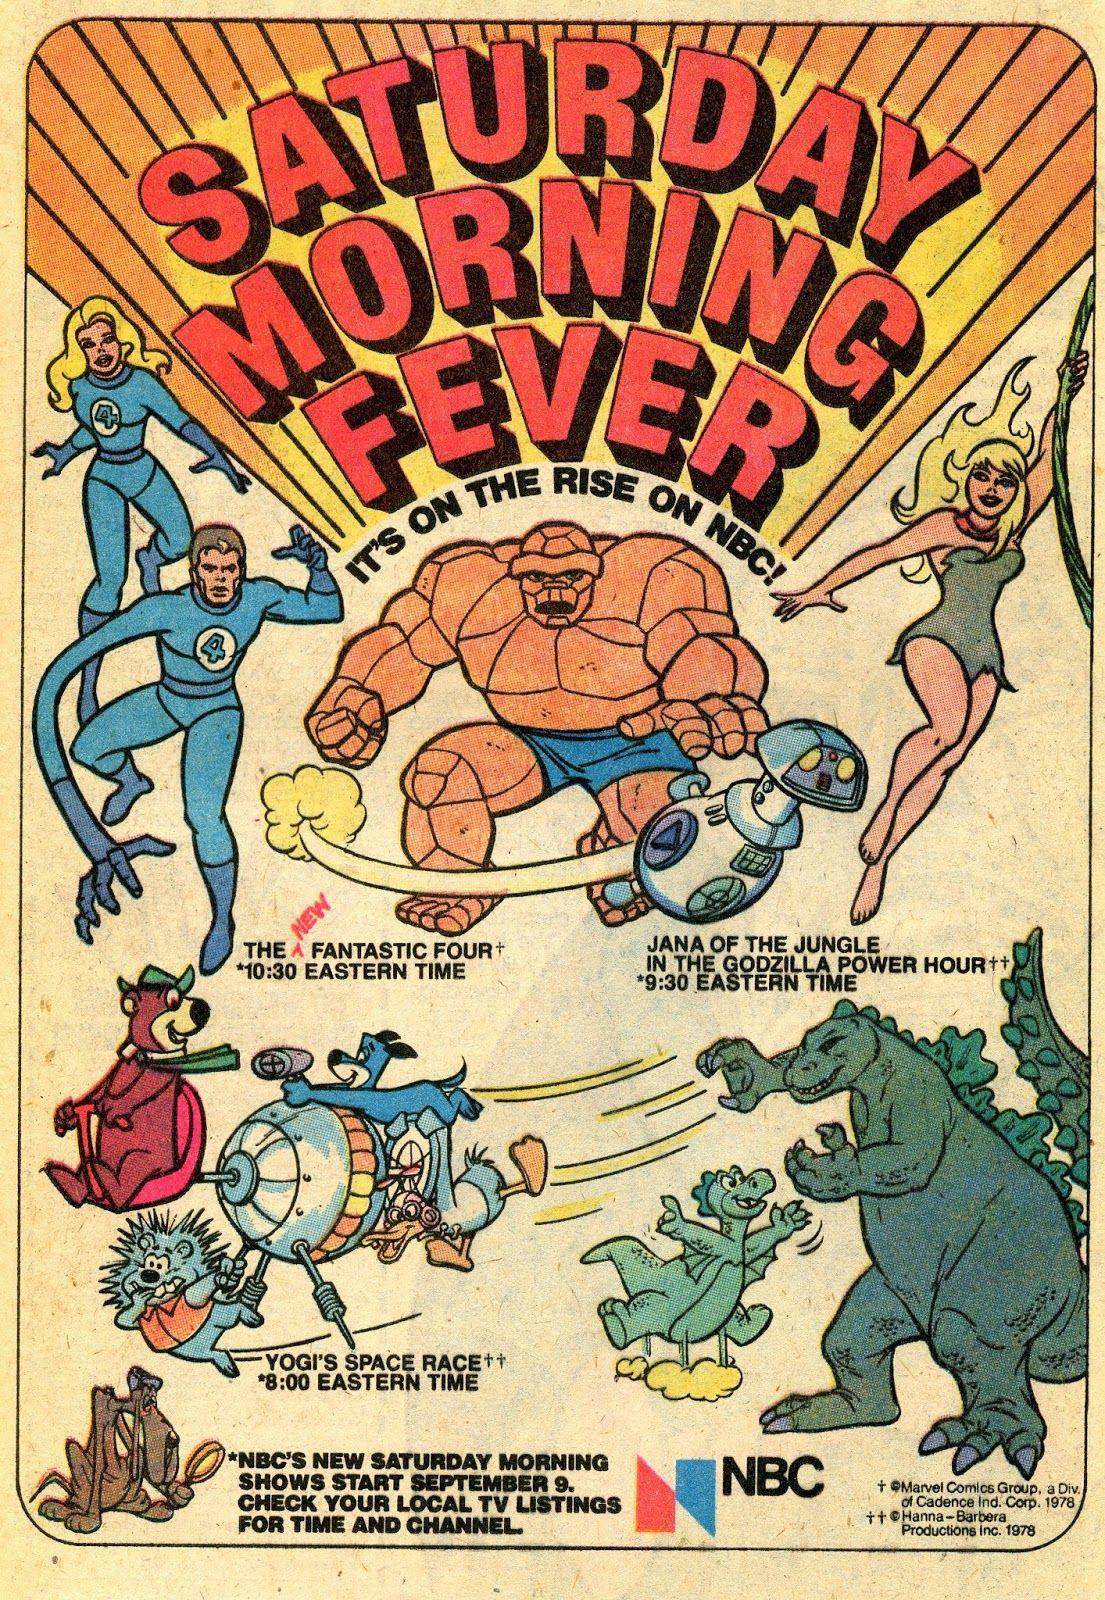 Saay Morning Cartoon ad - NBC's Saay morning Fever lineup of ...